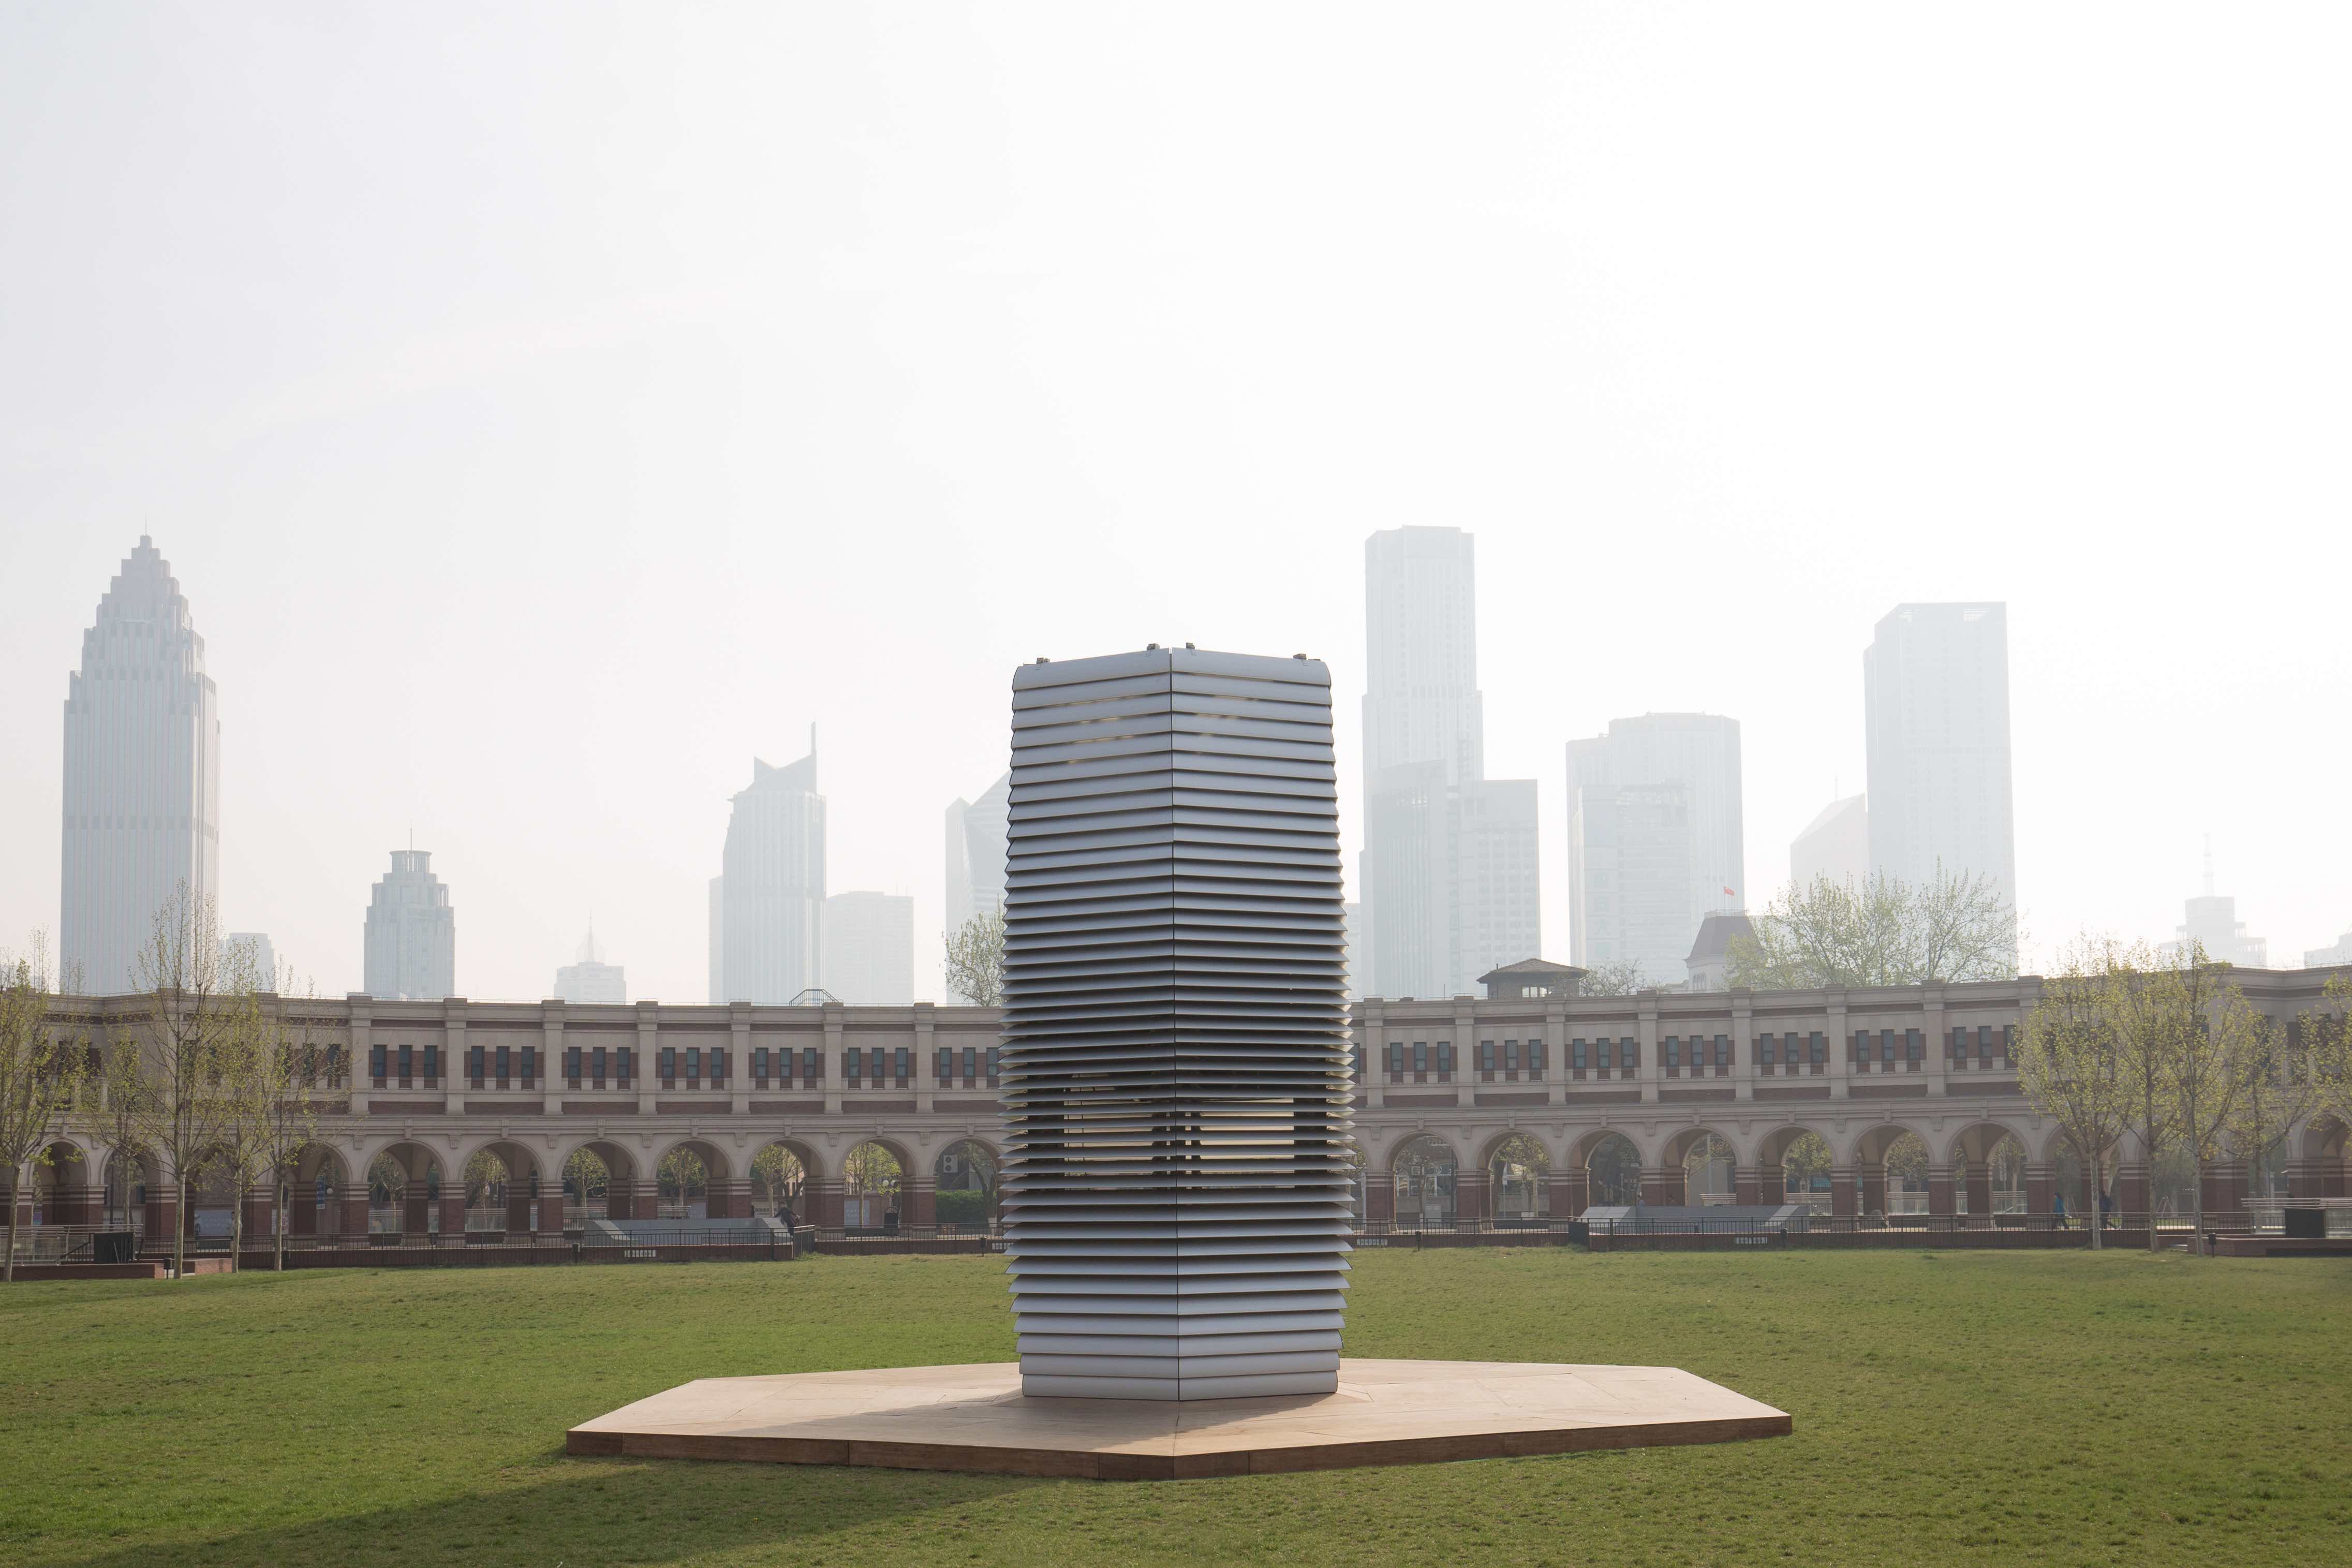 Smog Free Tower (źródło: materiały prasowe organizatora)